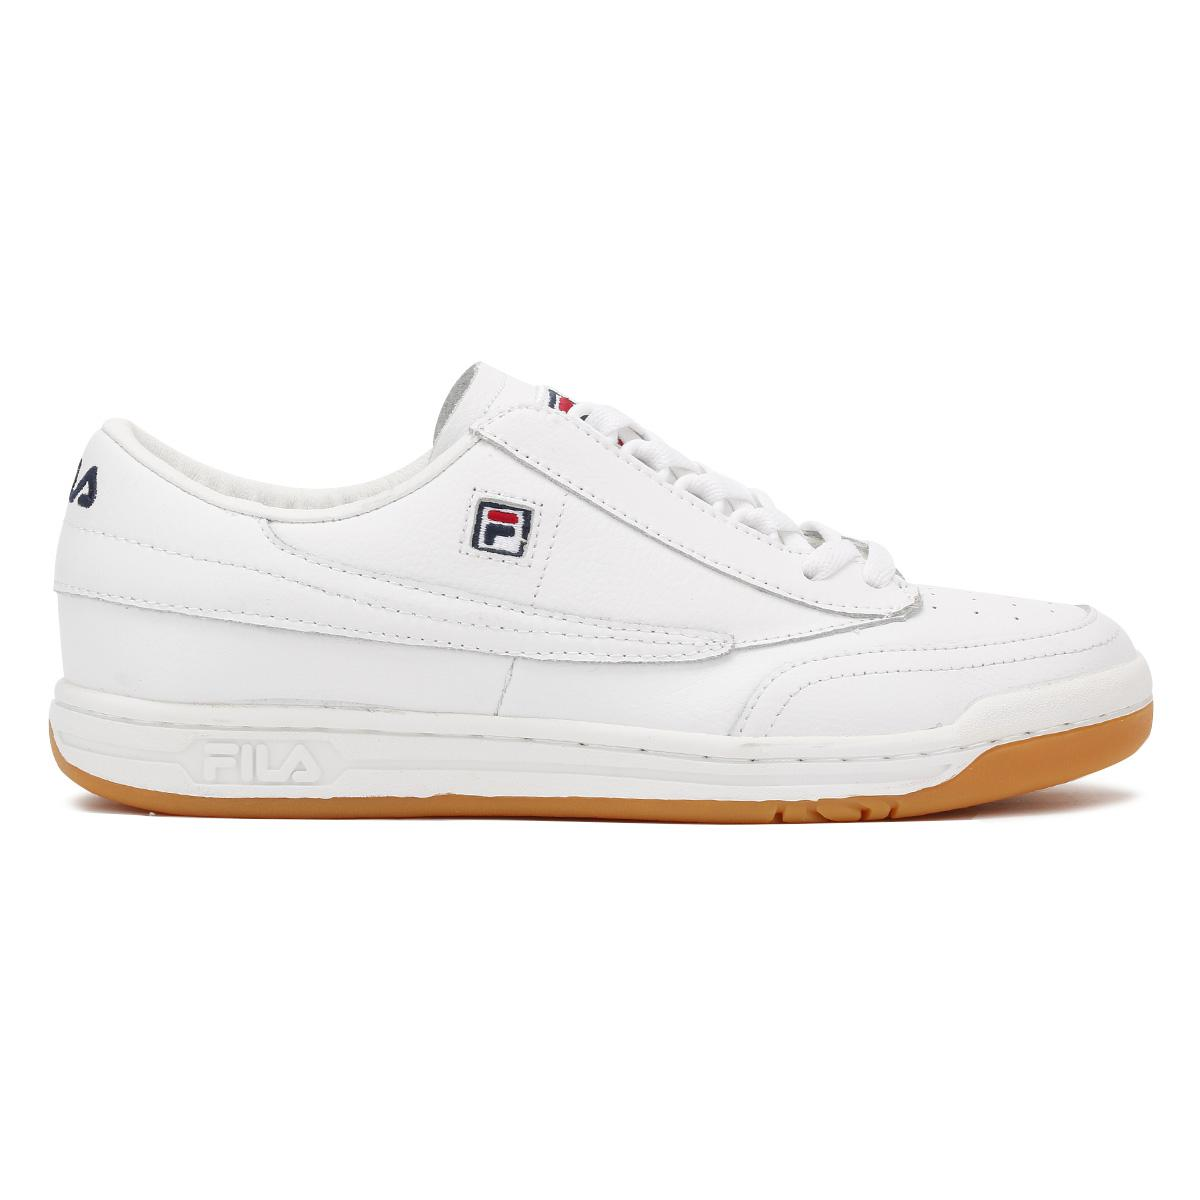 2cc82b69f8a9e2 Fila White / Gum Original Tennis Trainers in White for Men - Lyst